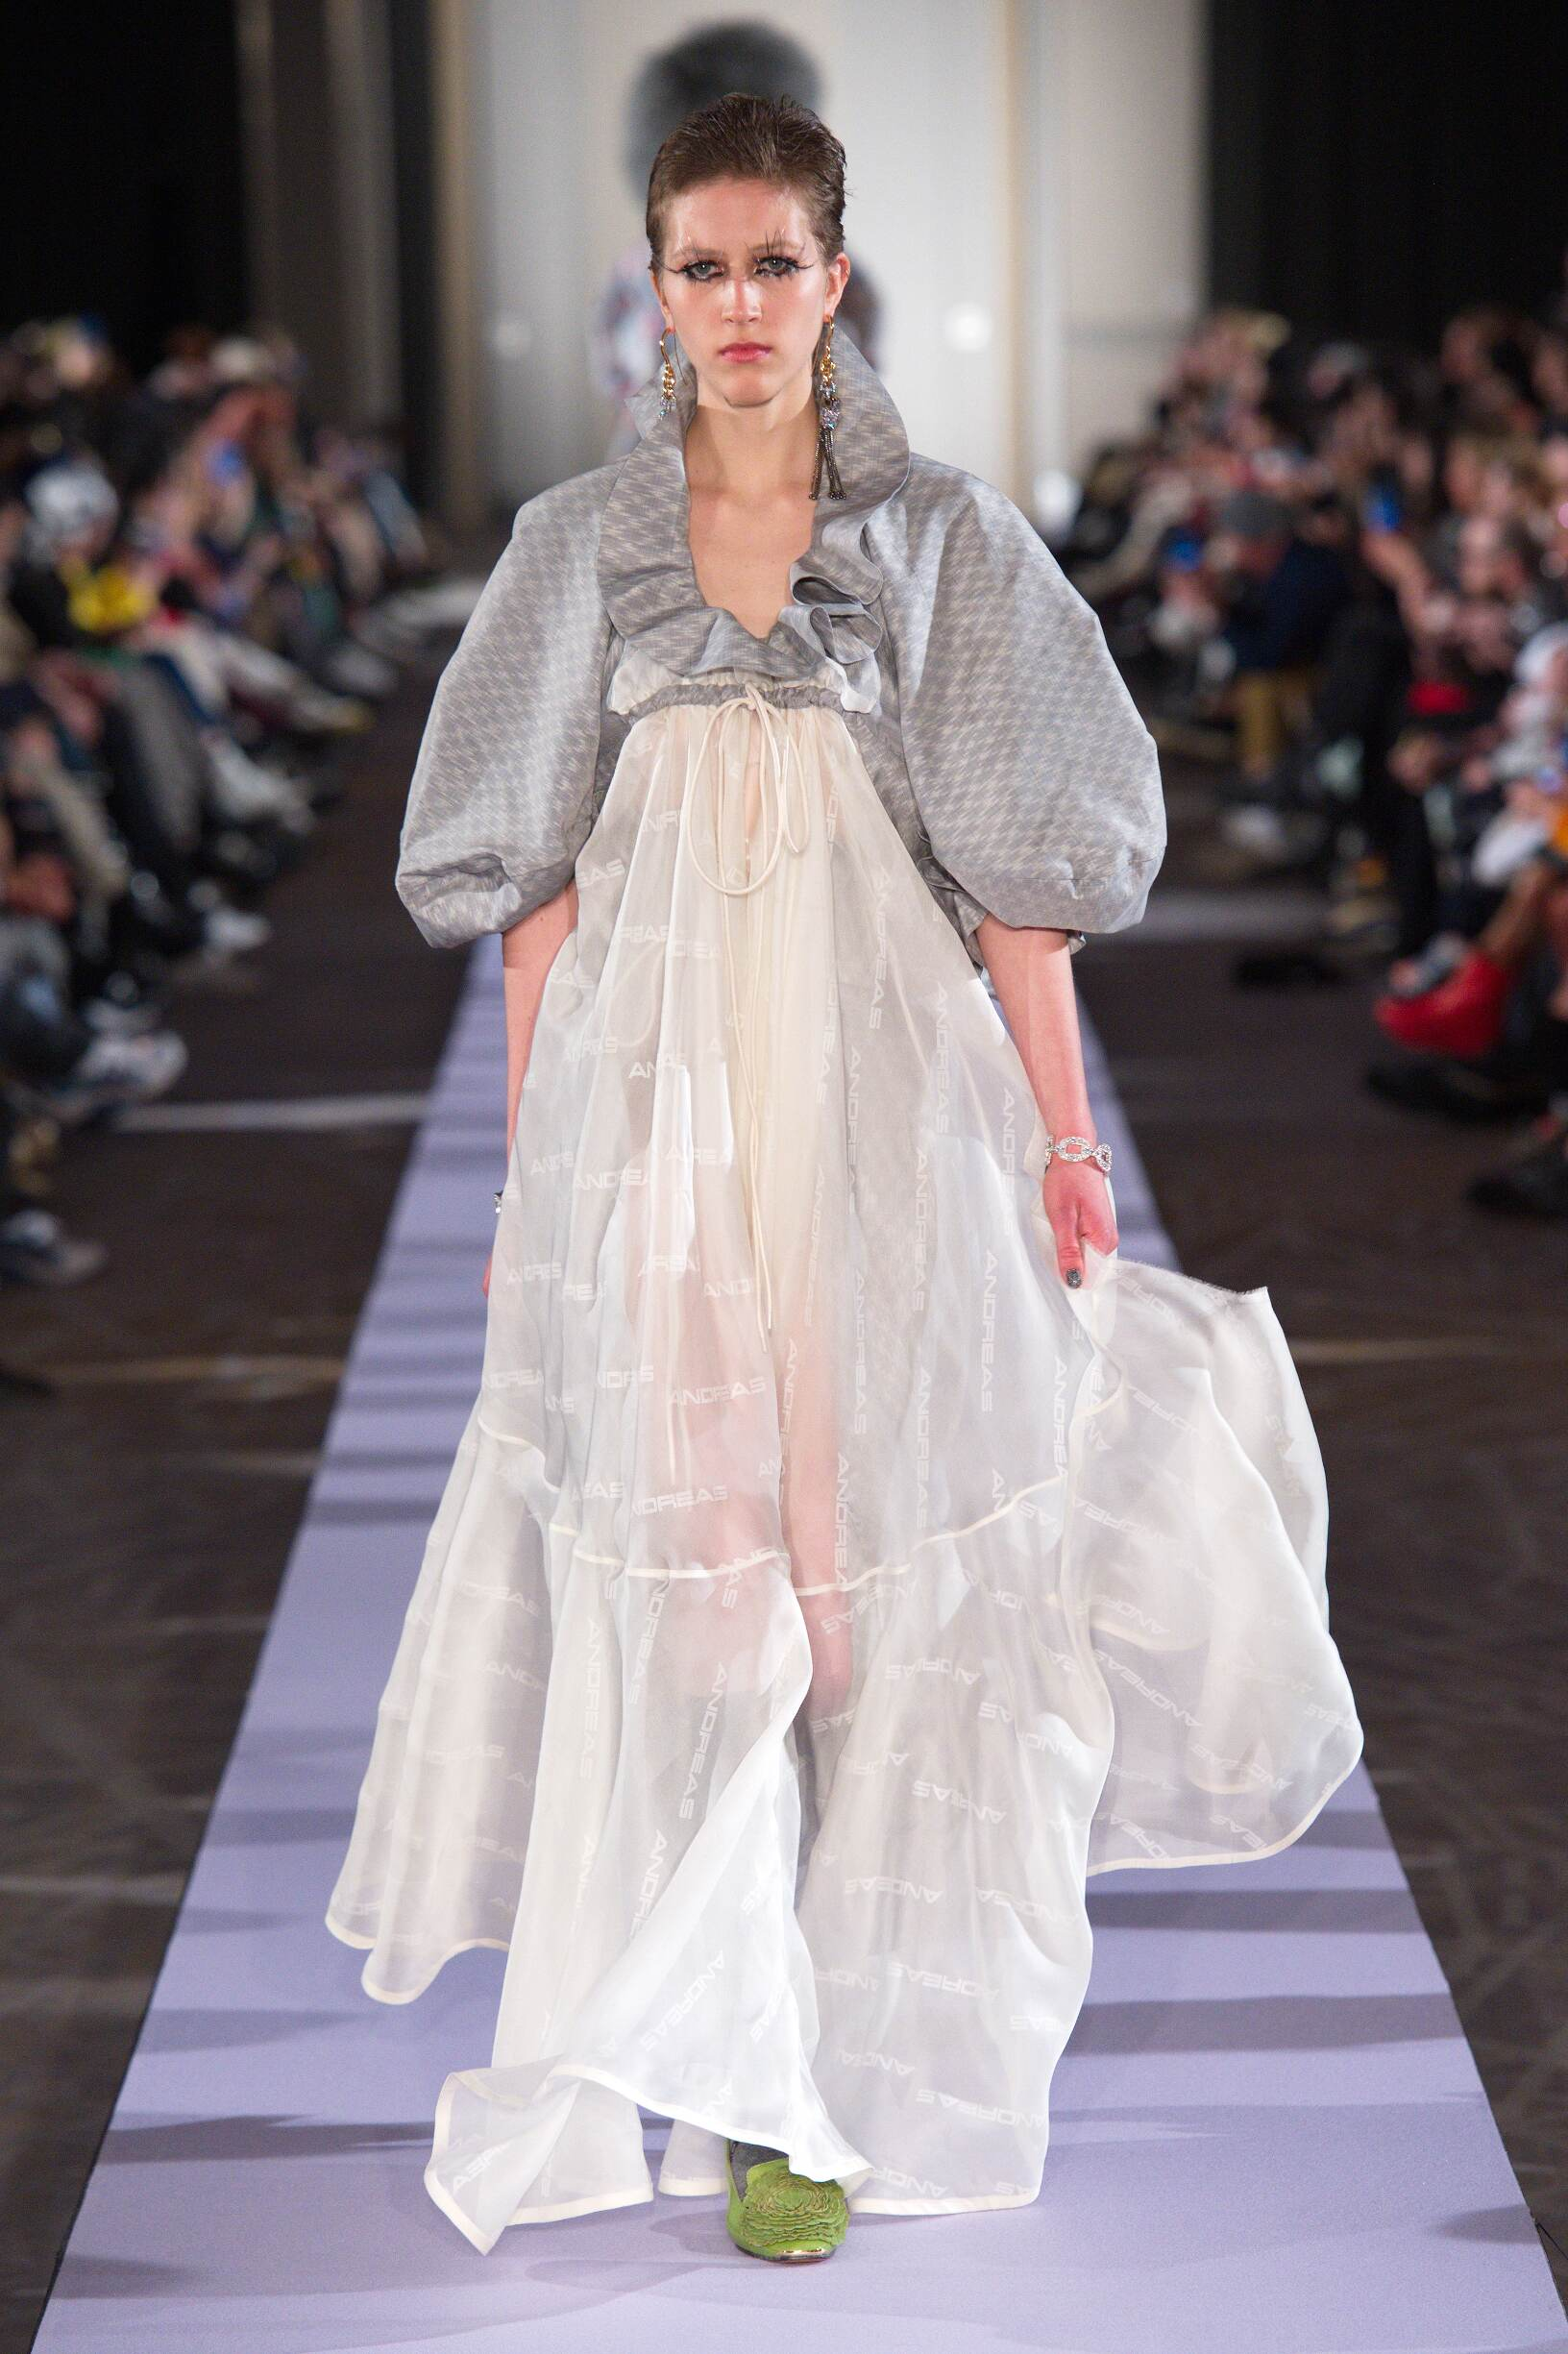 Catwalk Andreas Kronthaler for Vivienne Westwood Woman Fashion Show Winter 2019